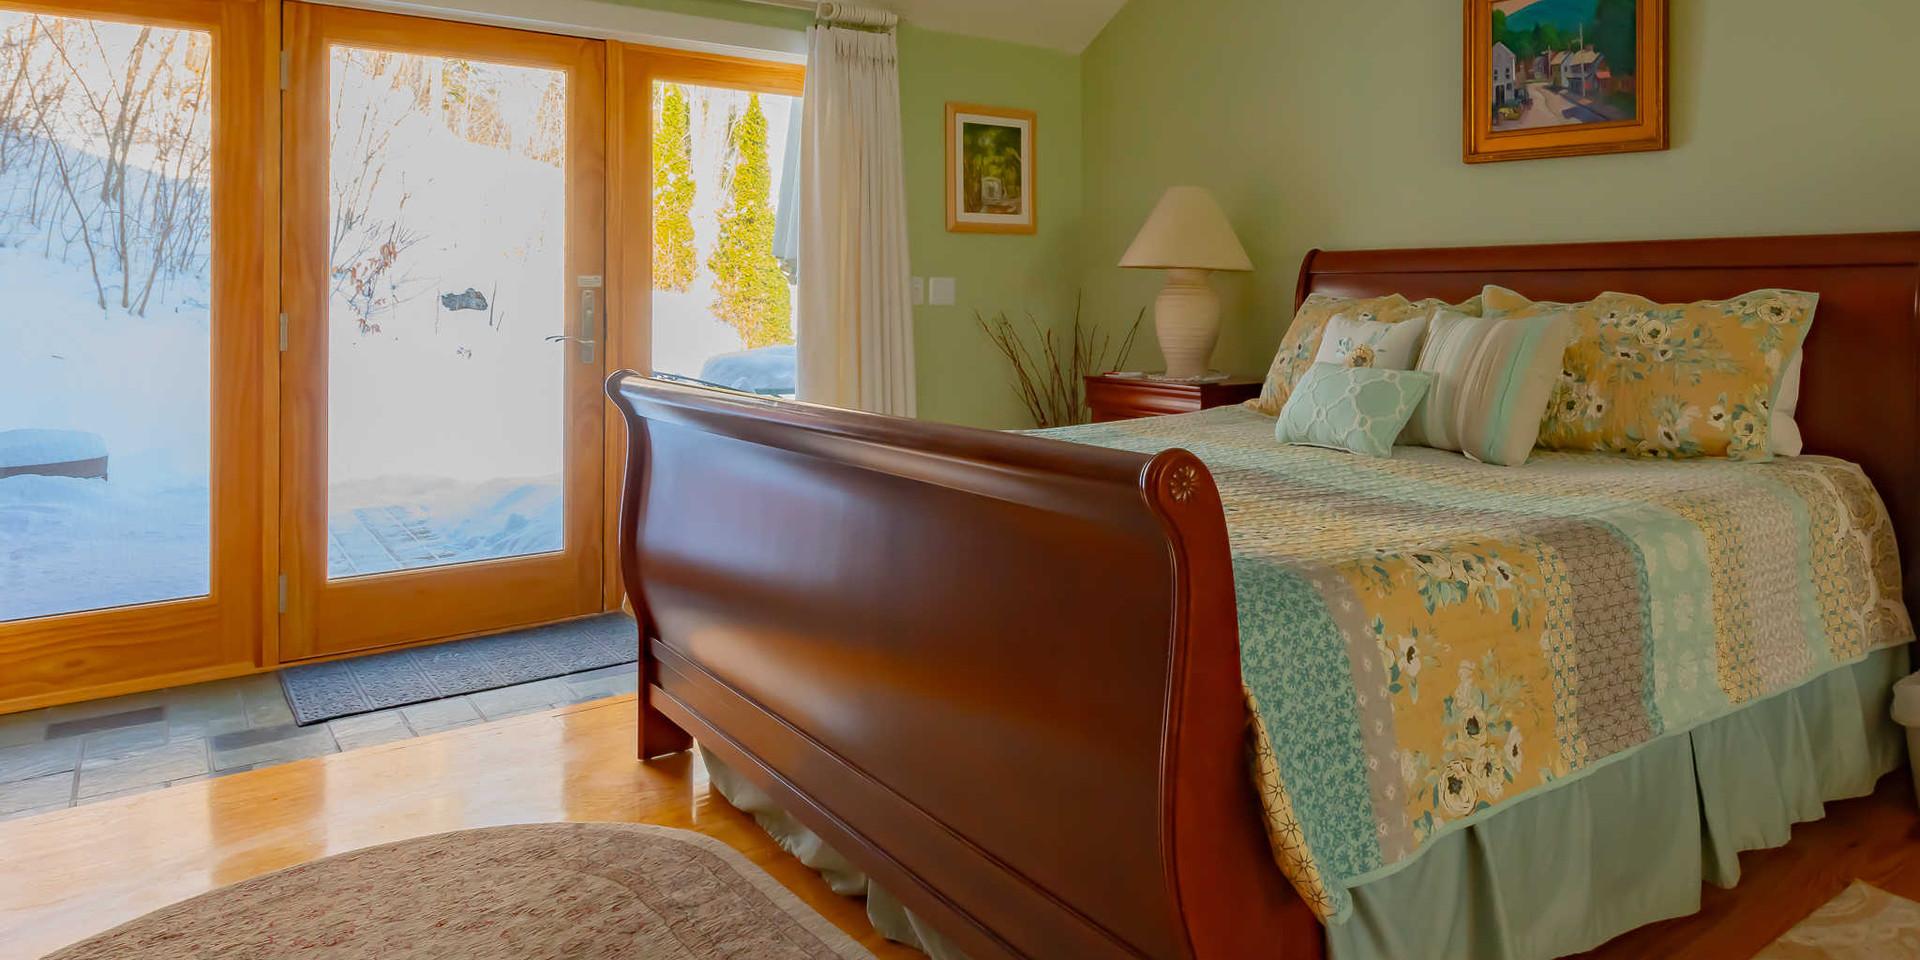 Honeymoon Suite at the Shaker Mill Inn